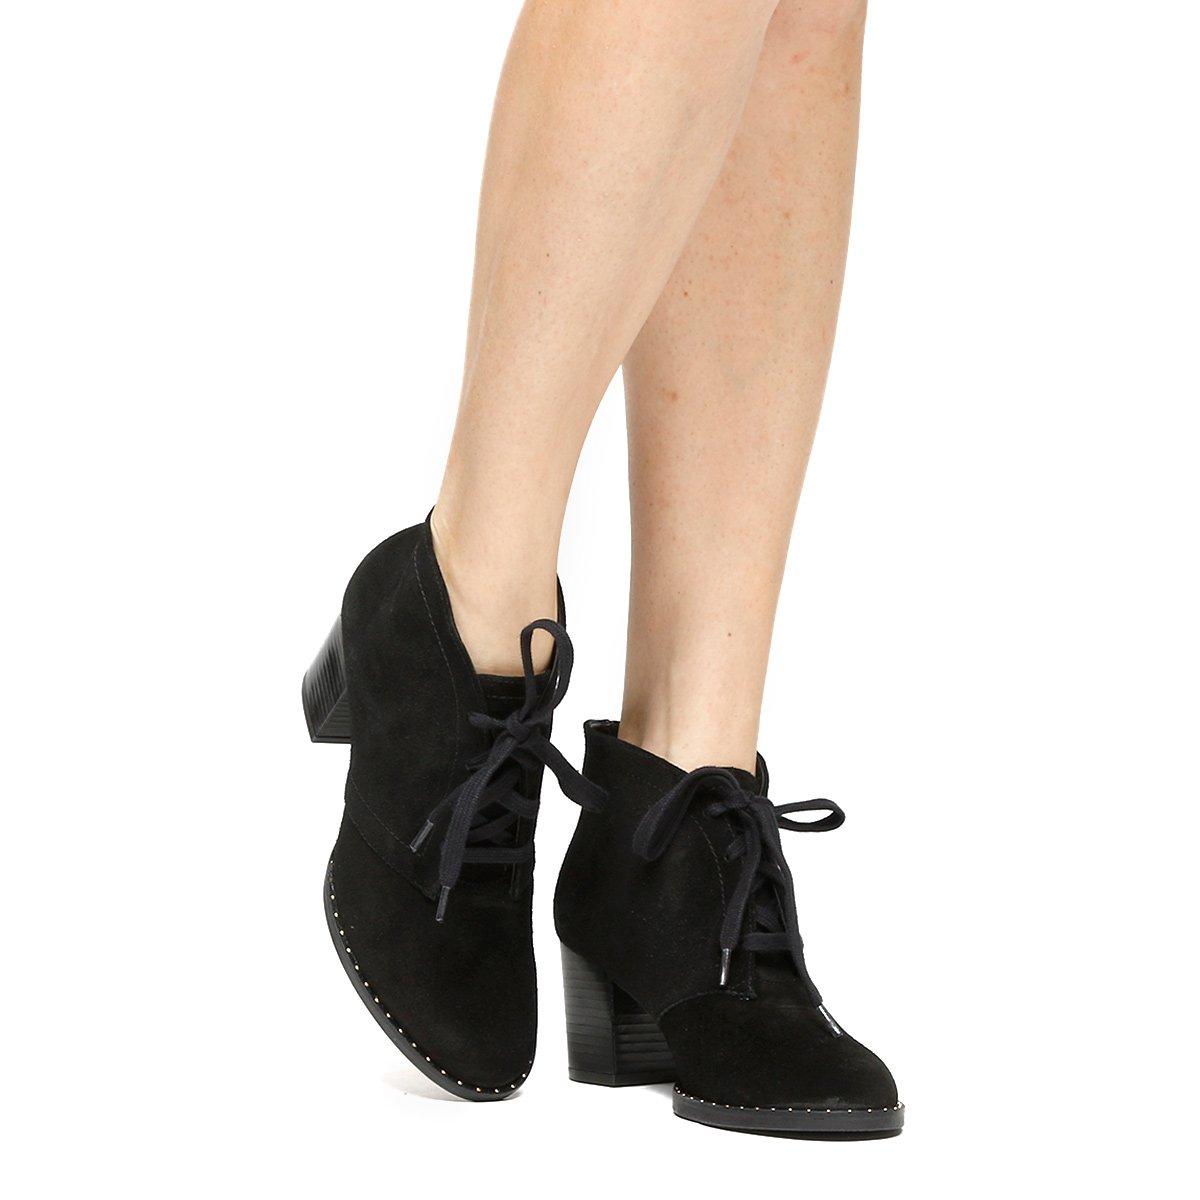 59f4ddb86c Bota Couro Shoestock London Fog Vira Cravinhos Feminina